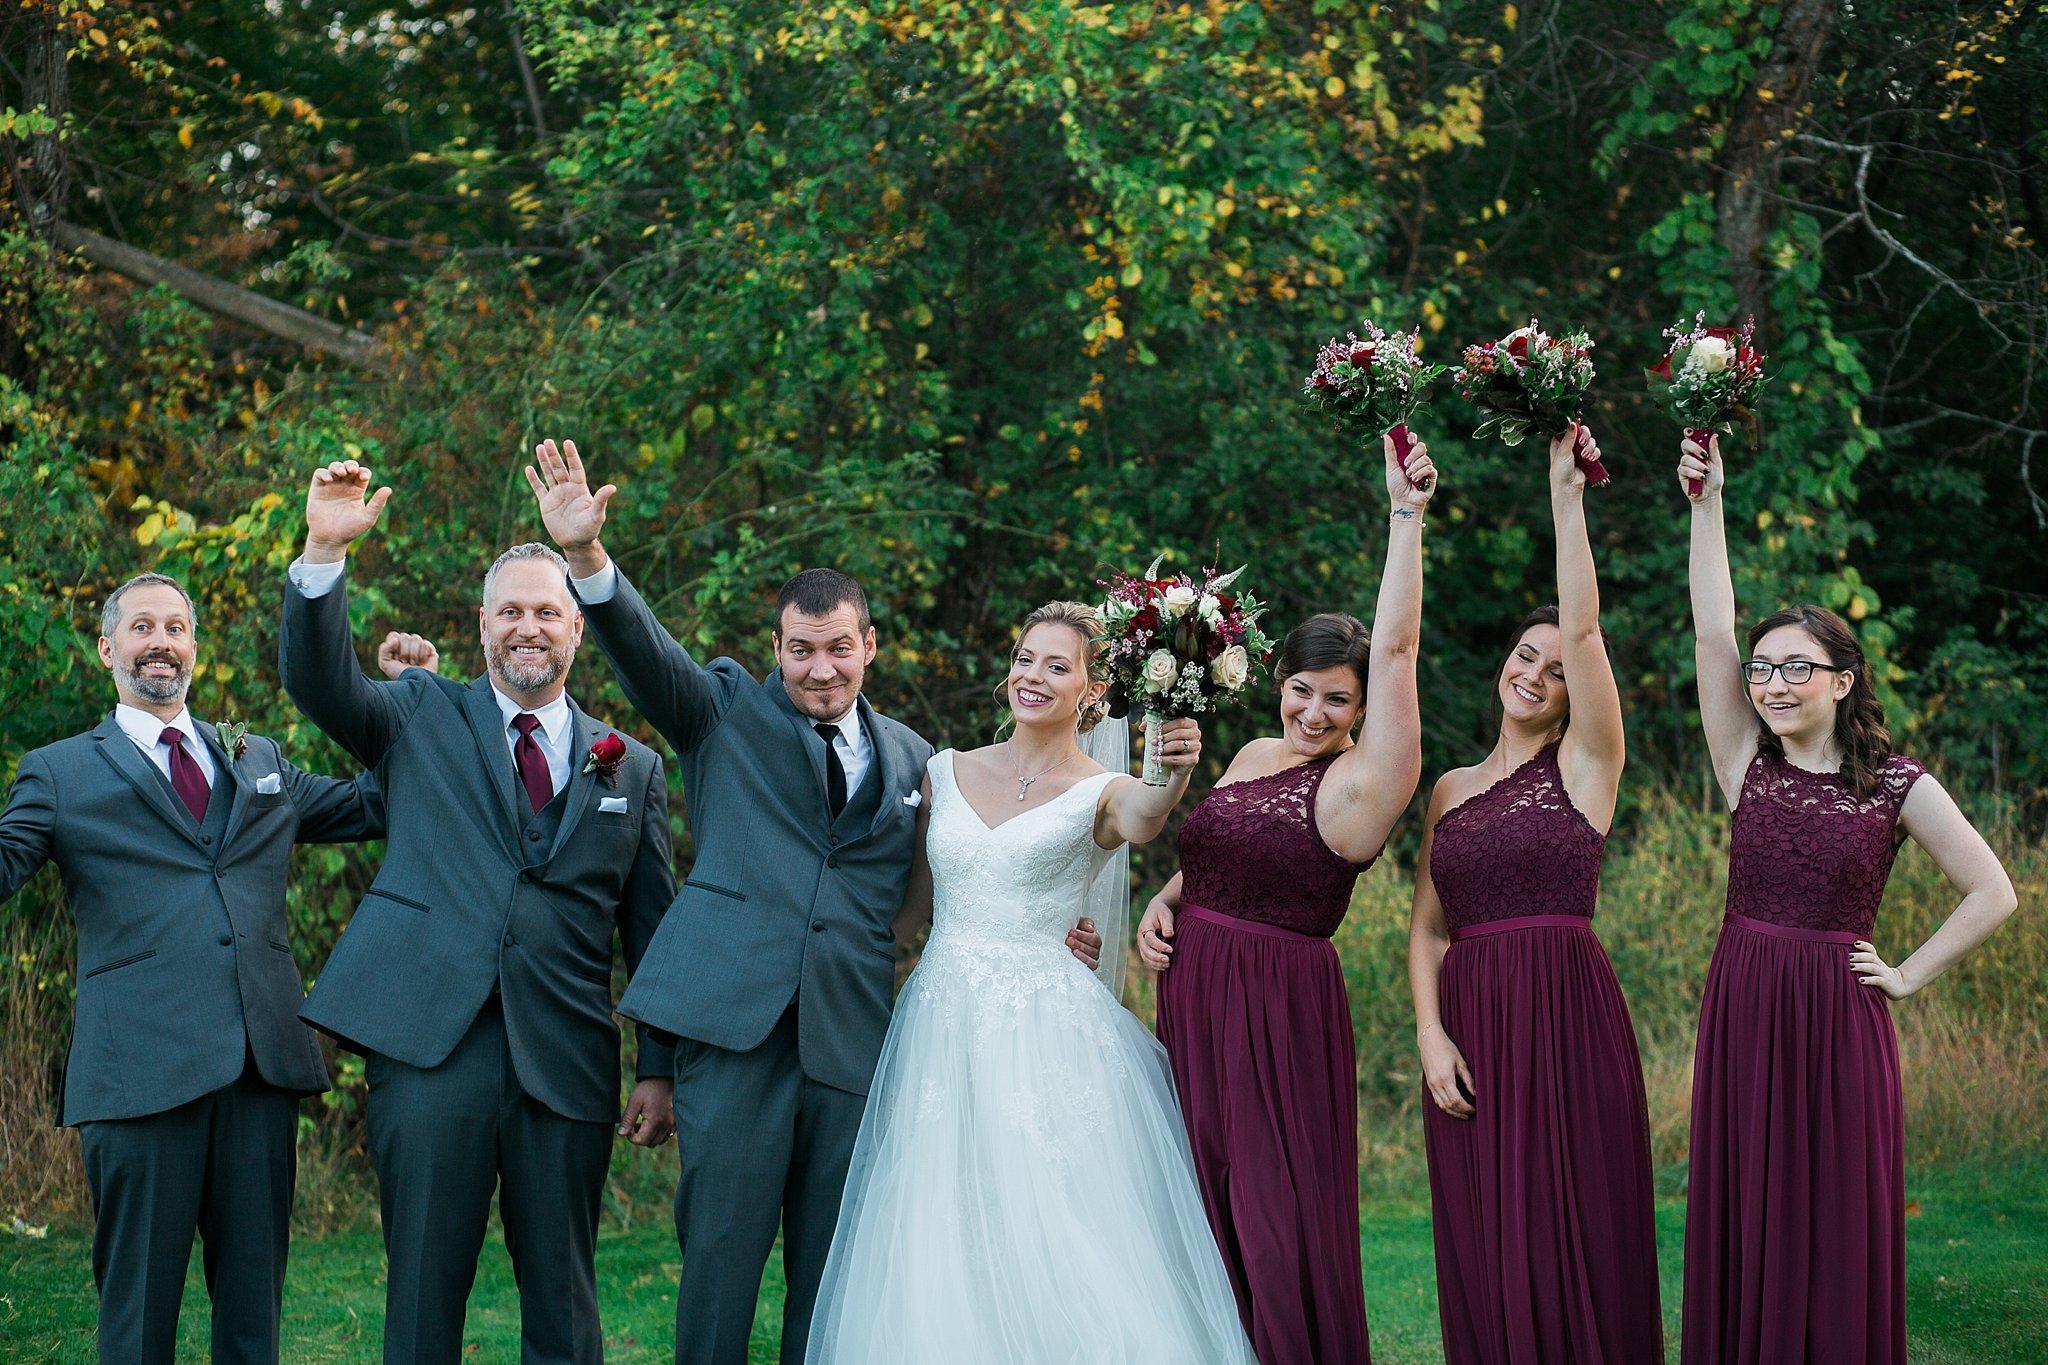 New Windsor New York Hudson Valley New York Wedding Photographer 56.jpg